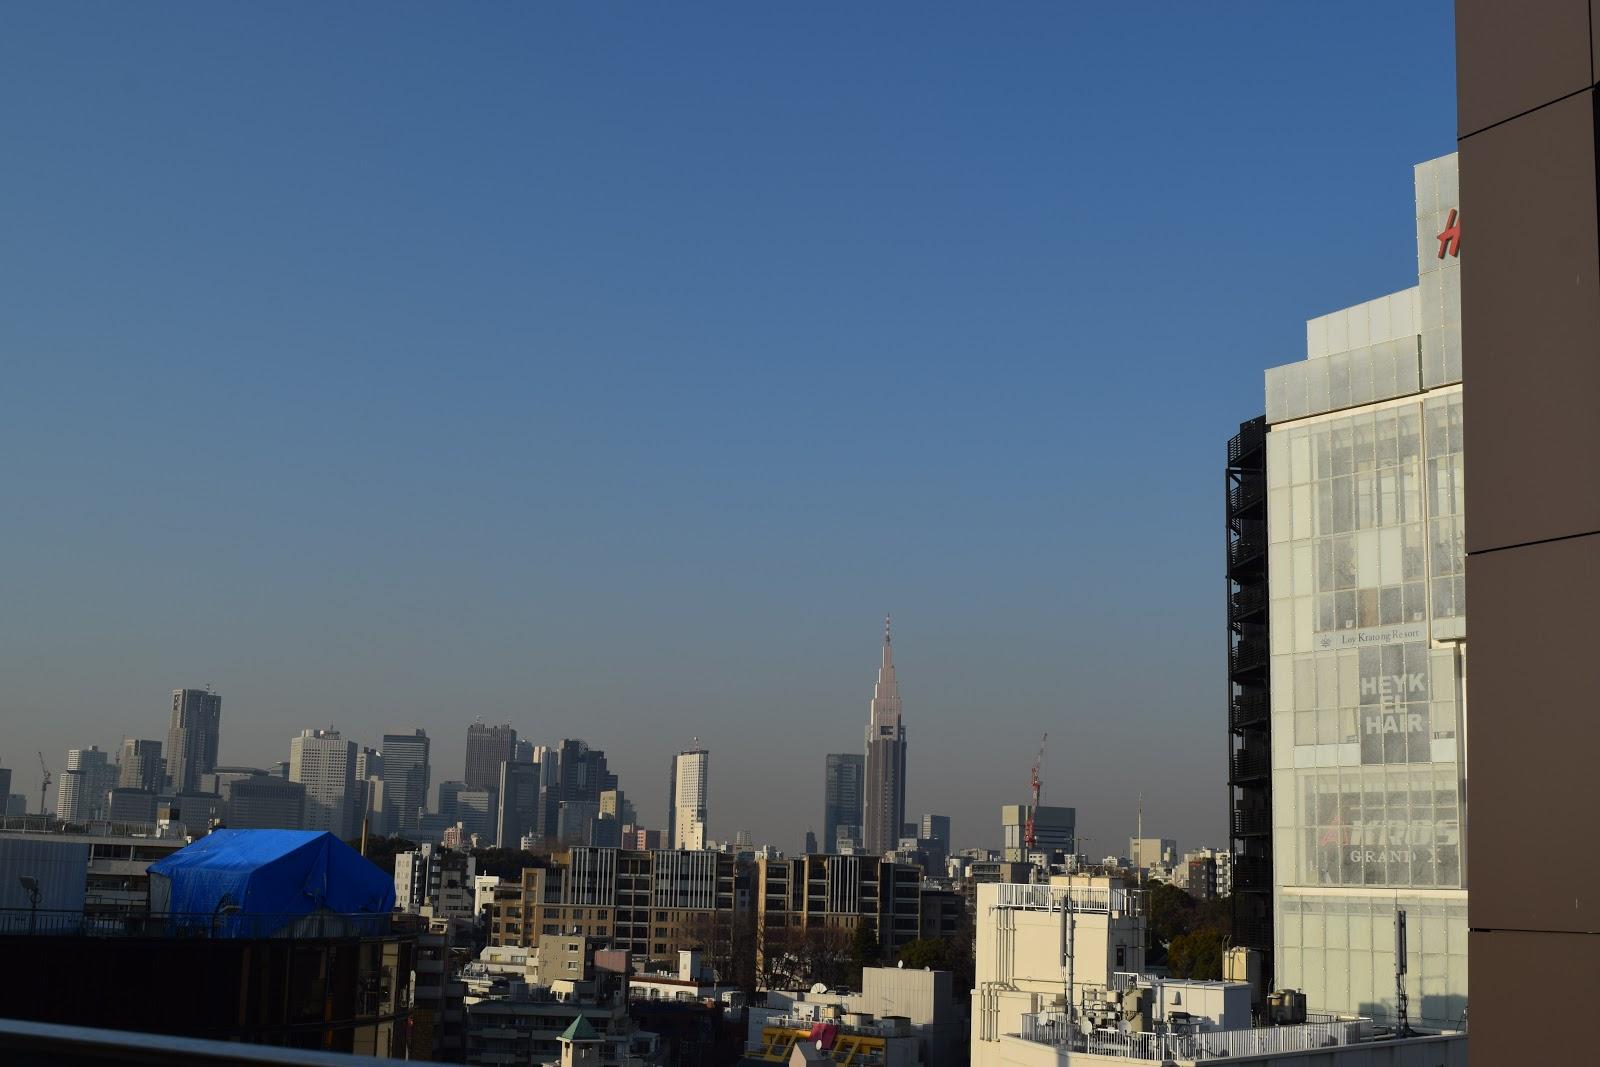 Tokyo skyline from the top of Tokyu plaza, Omotesando